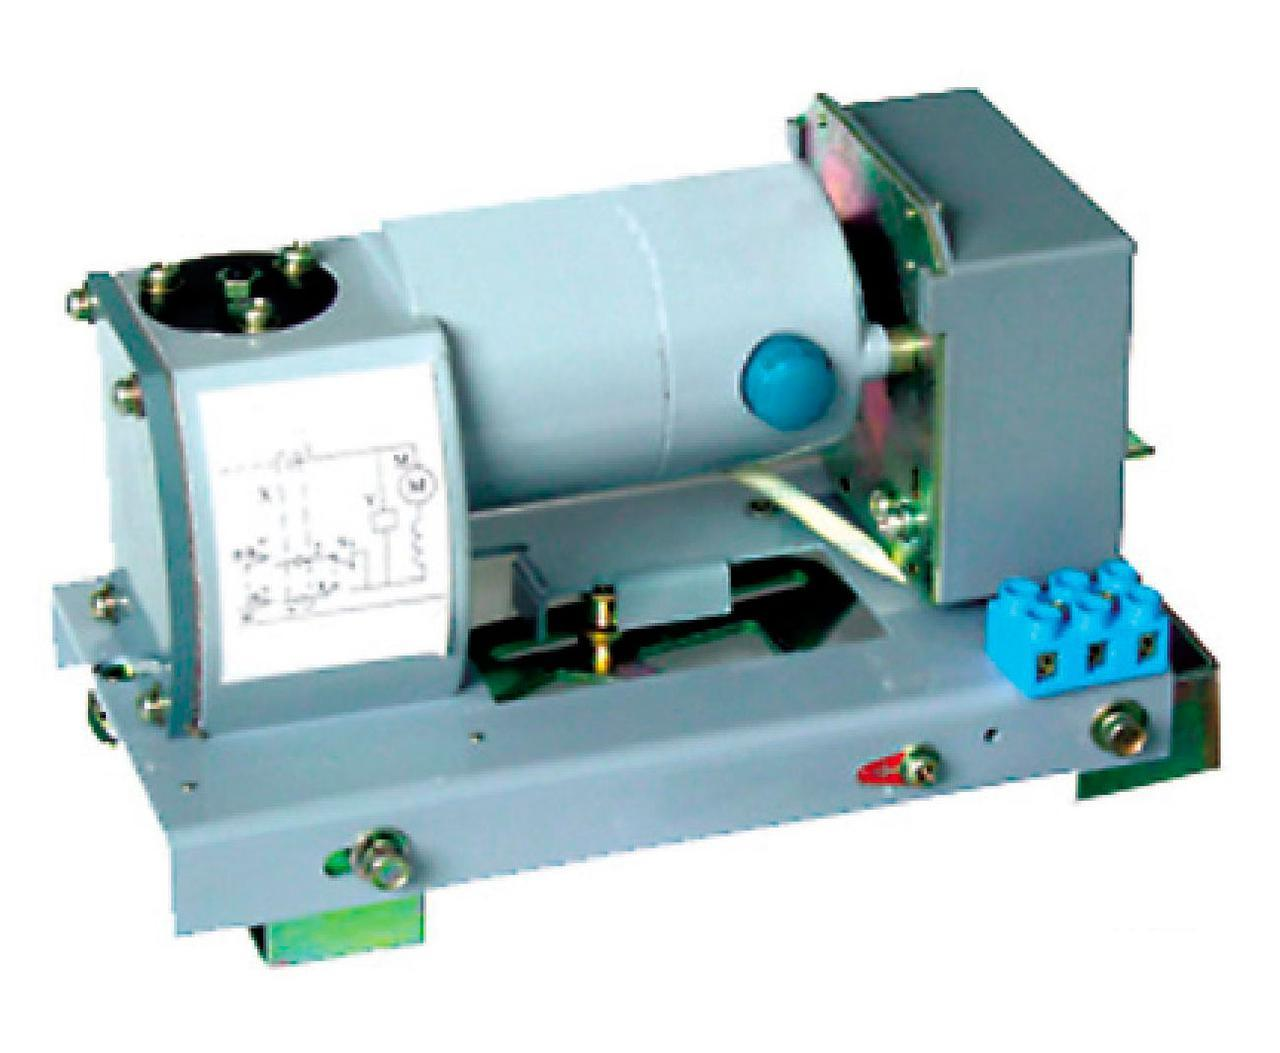 Привод электромеханический 400S (230V) ПЭ 77Л-400